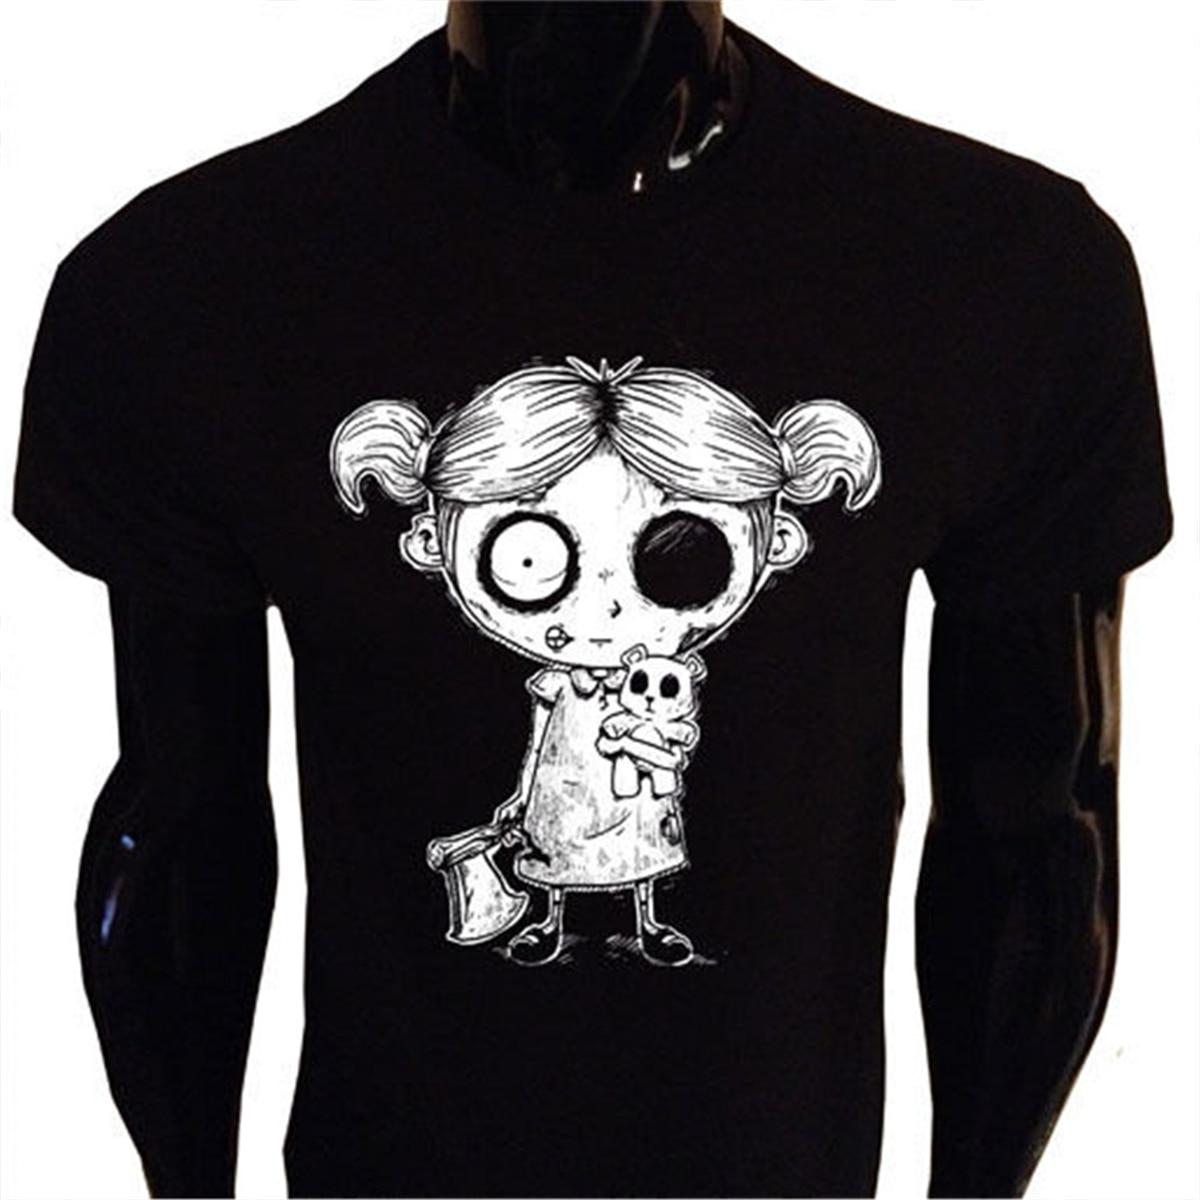 Hollywood Undead Mugshots Girls Juniors Black T Shirt New Official Soft